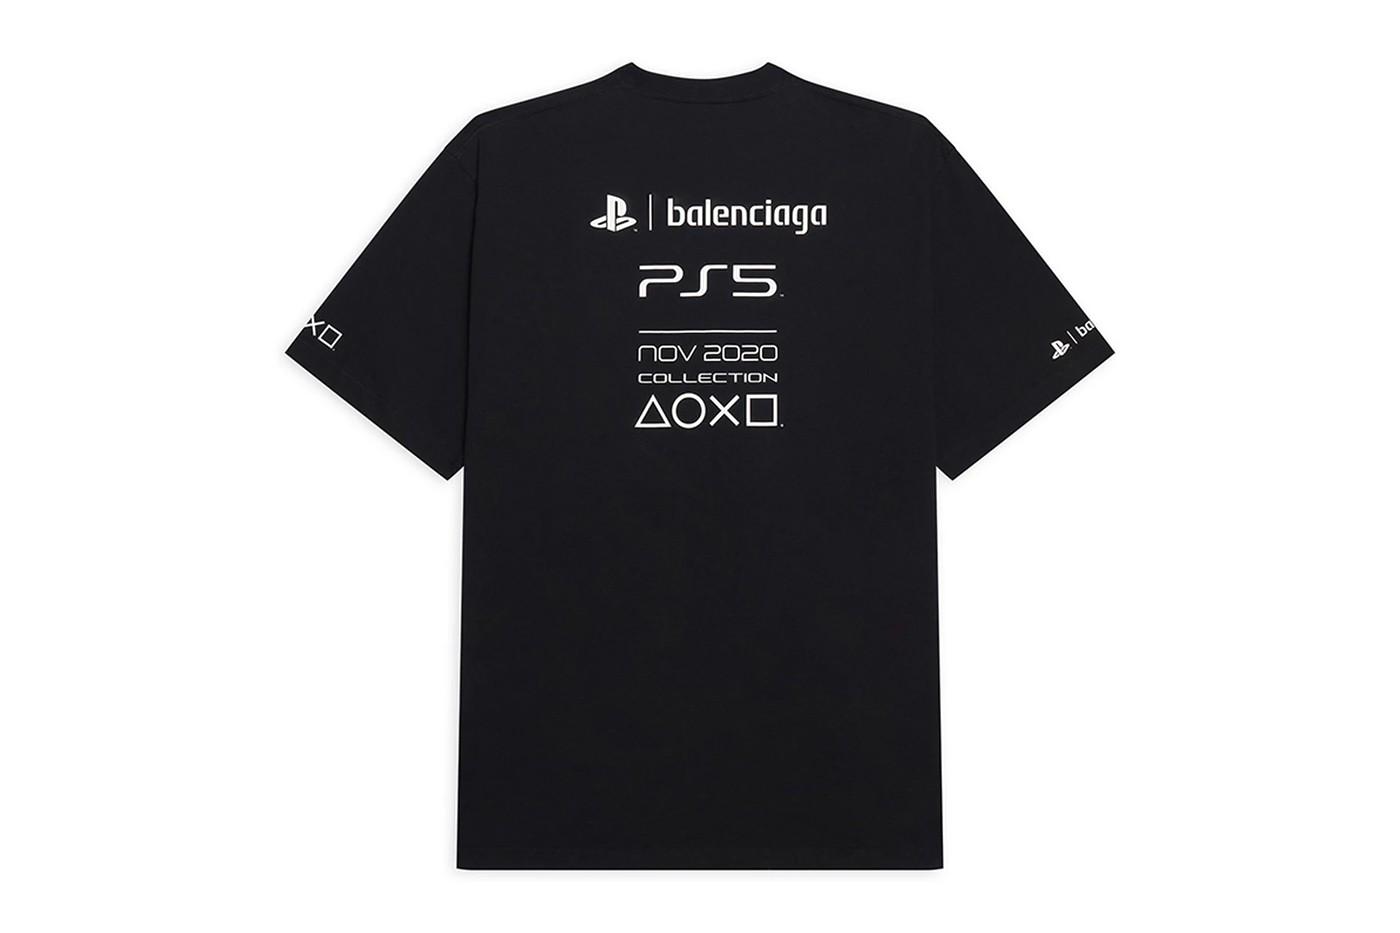 Balenciaga выпустил мерч для игровой консоли Sony PlayStation 5 (фото 2)